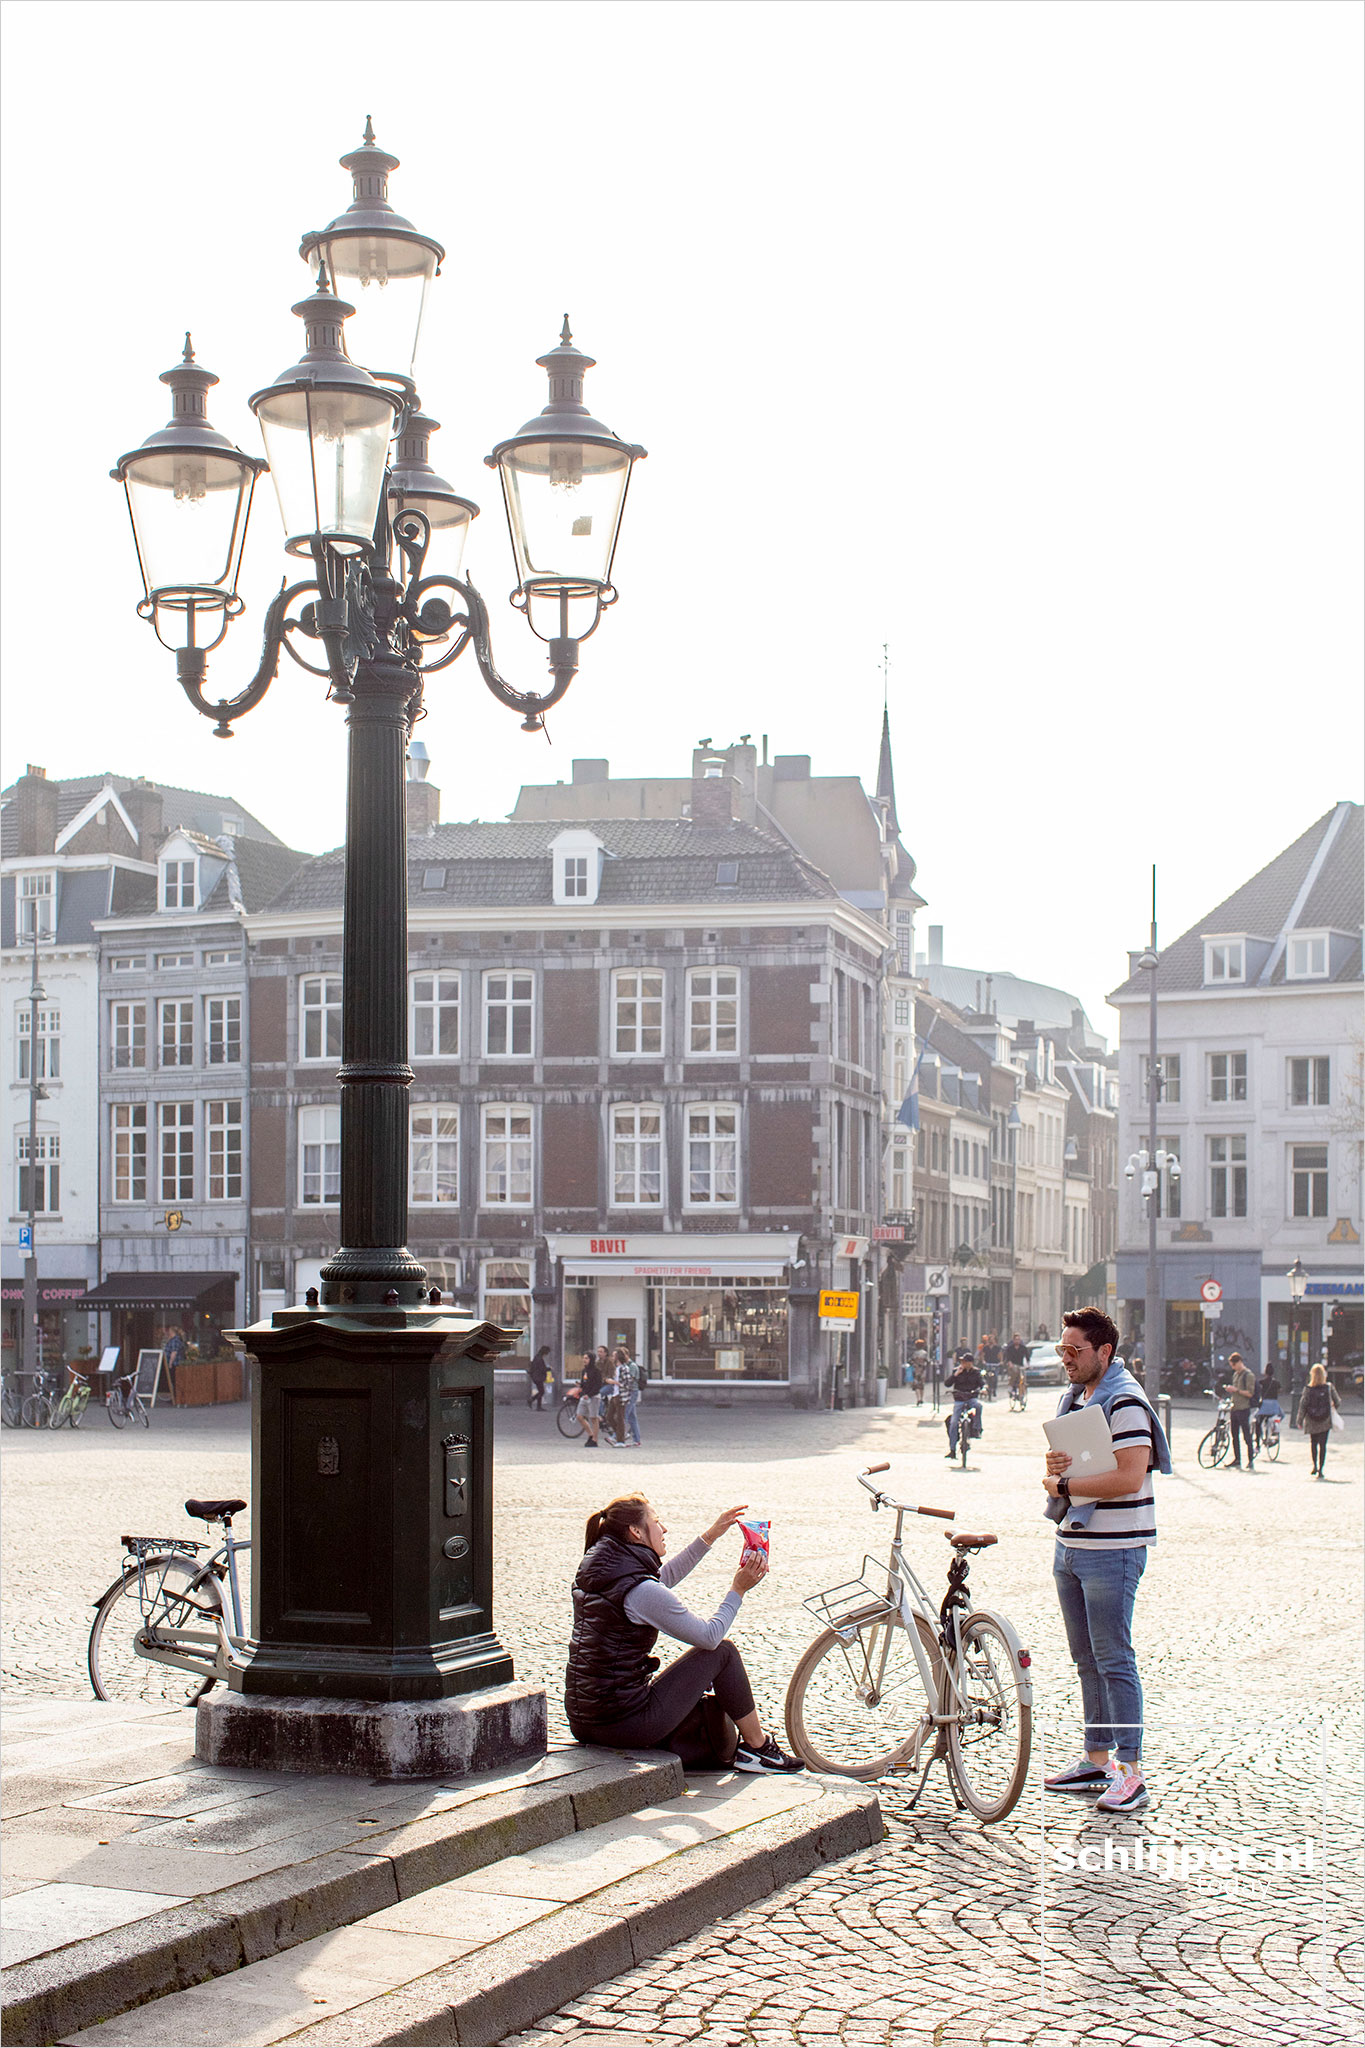 The Netherlands, Maastricht, 1 april 2021